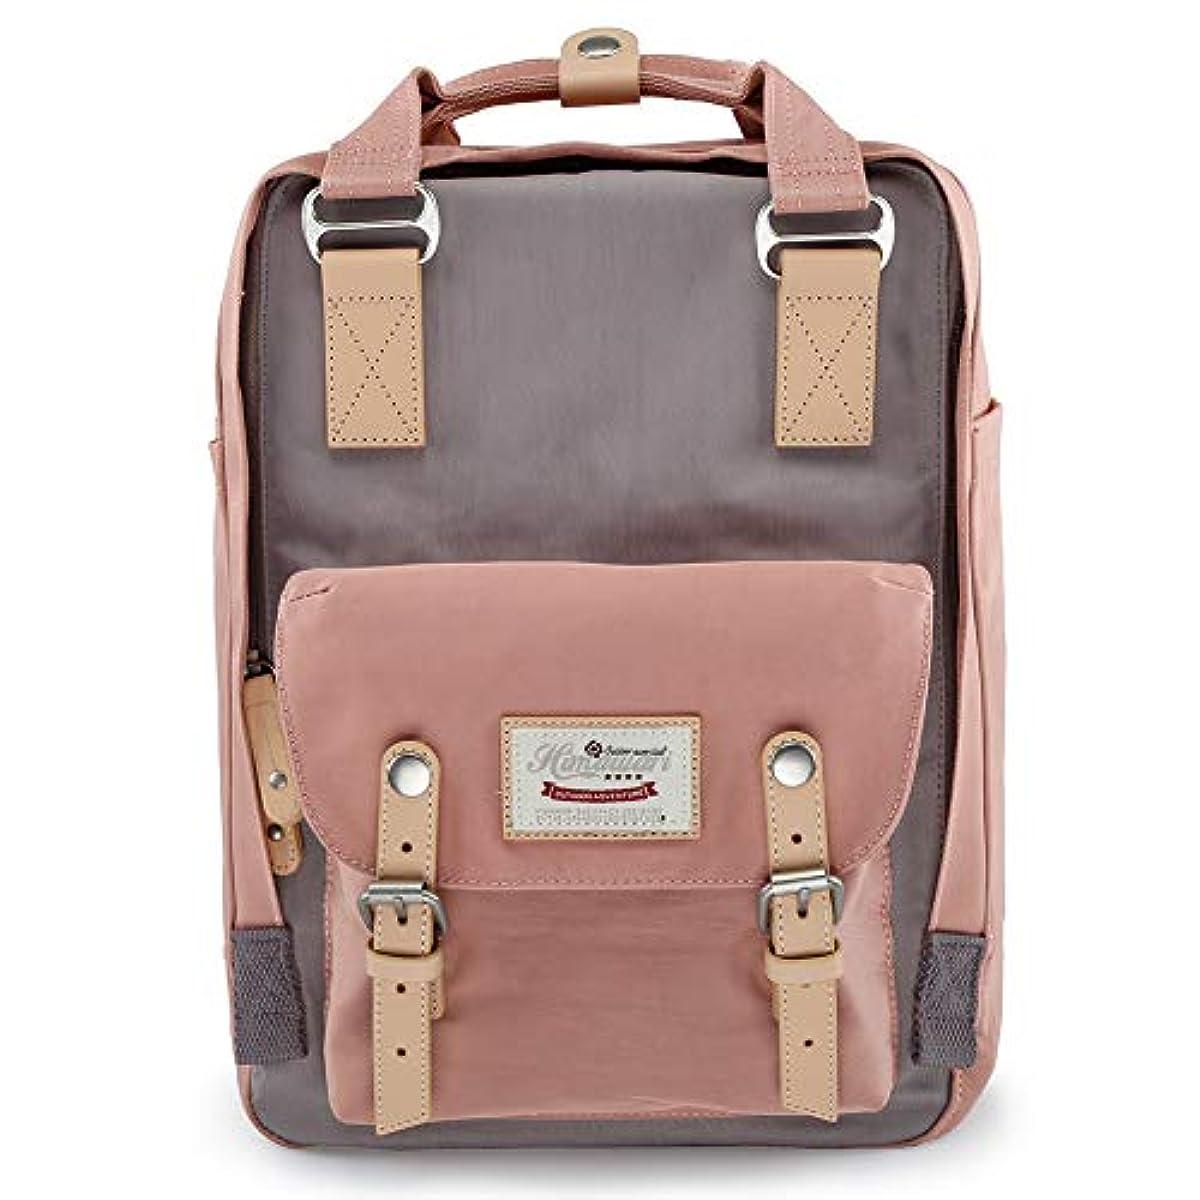 74f489a382b7 Details about Himawari Backpack Waterproof Backpack 14.9